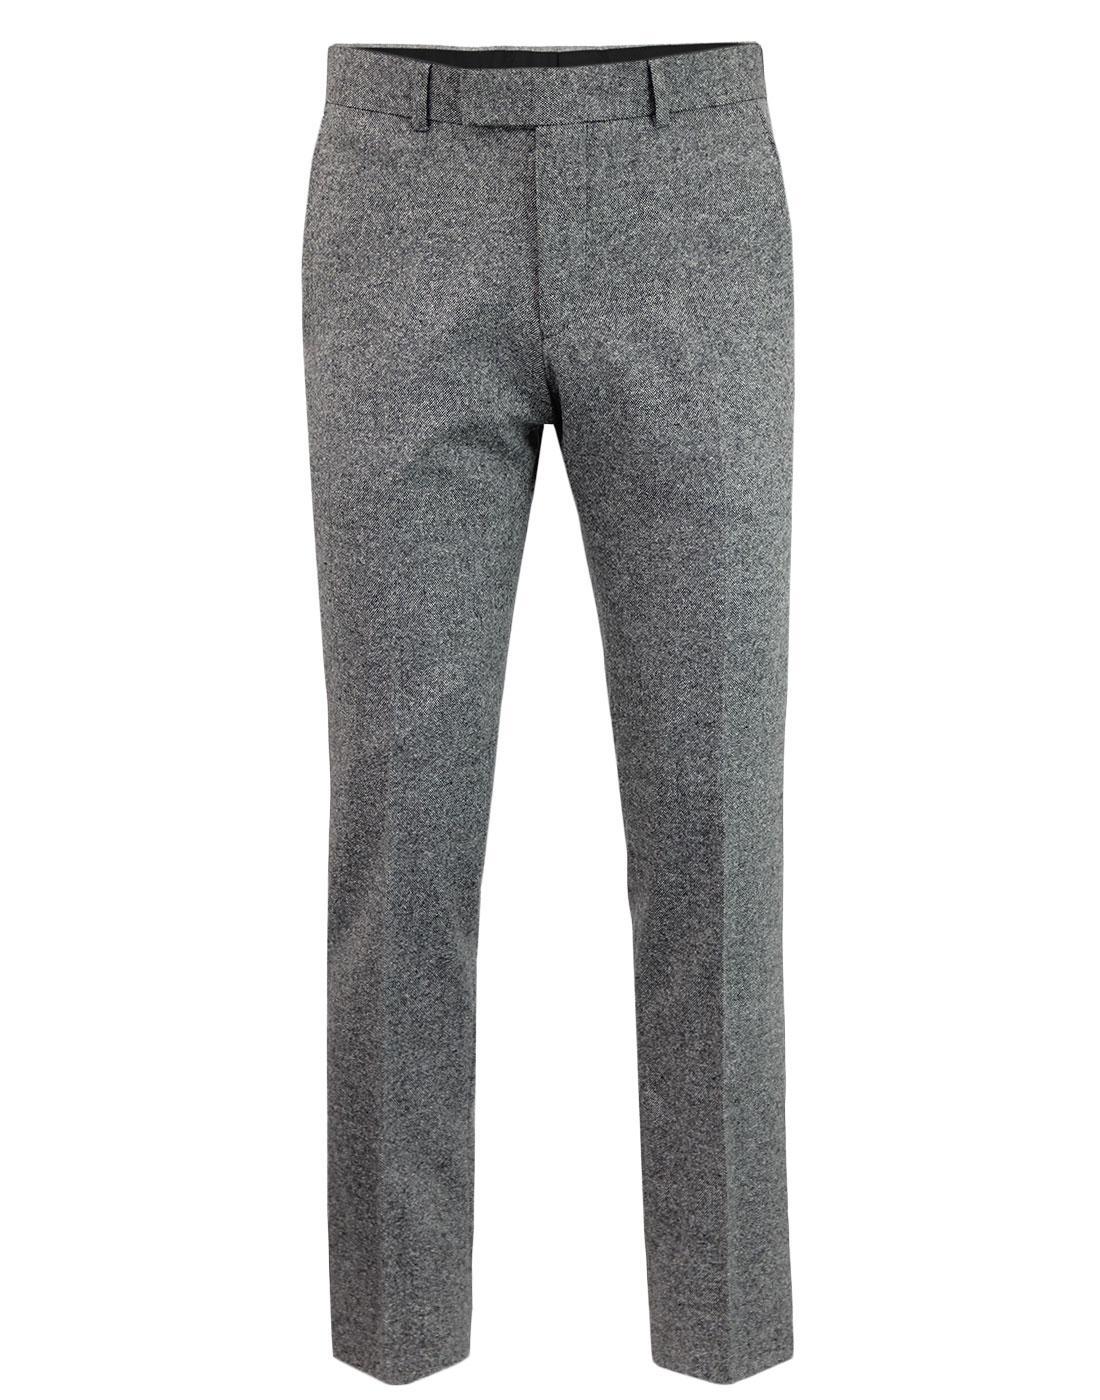 Retro Mod Donegal Fleck Slim Suit Trousers SILVER